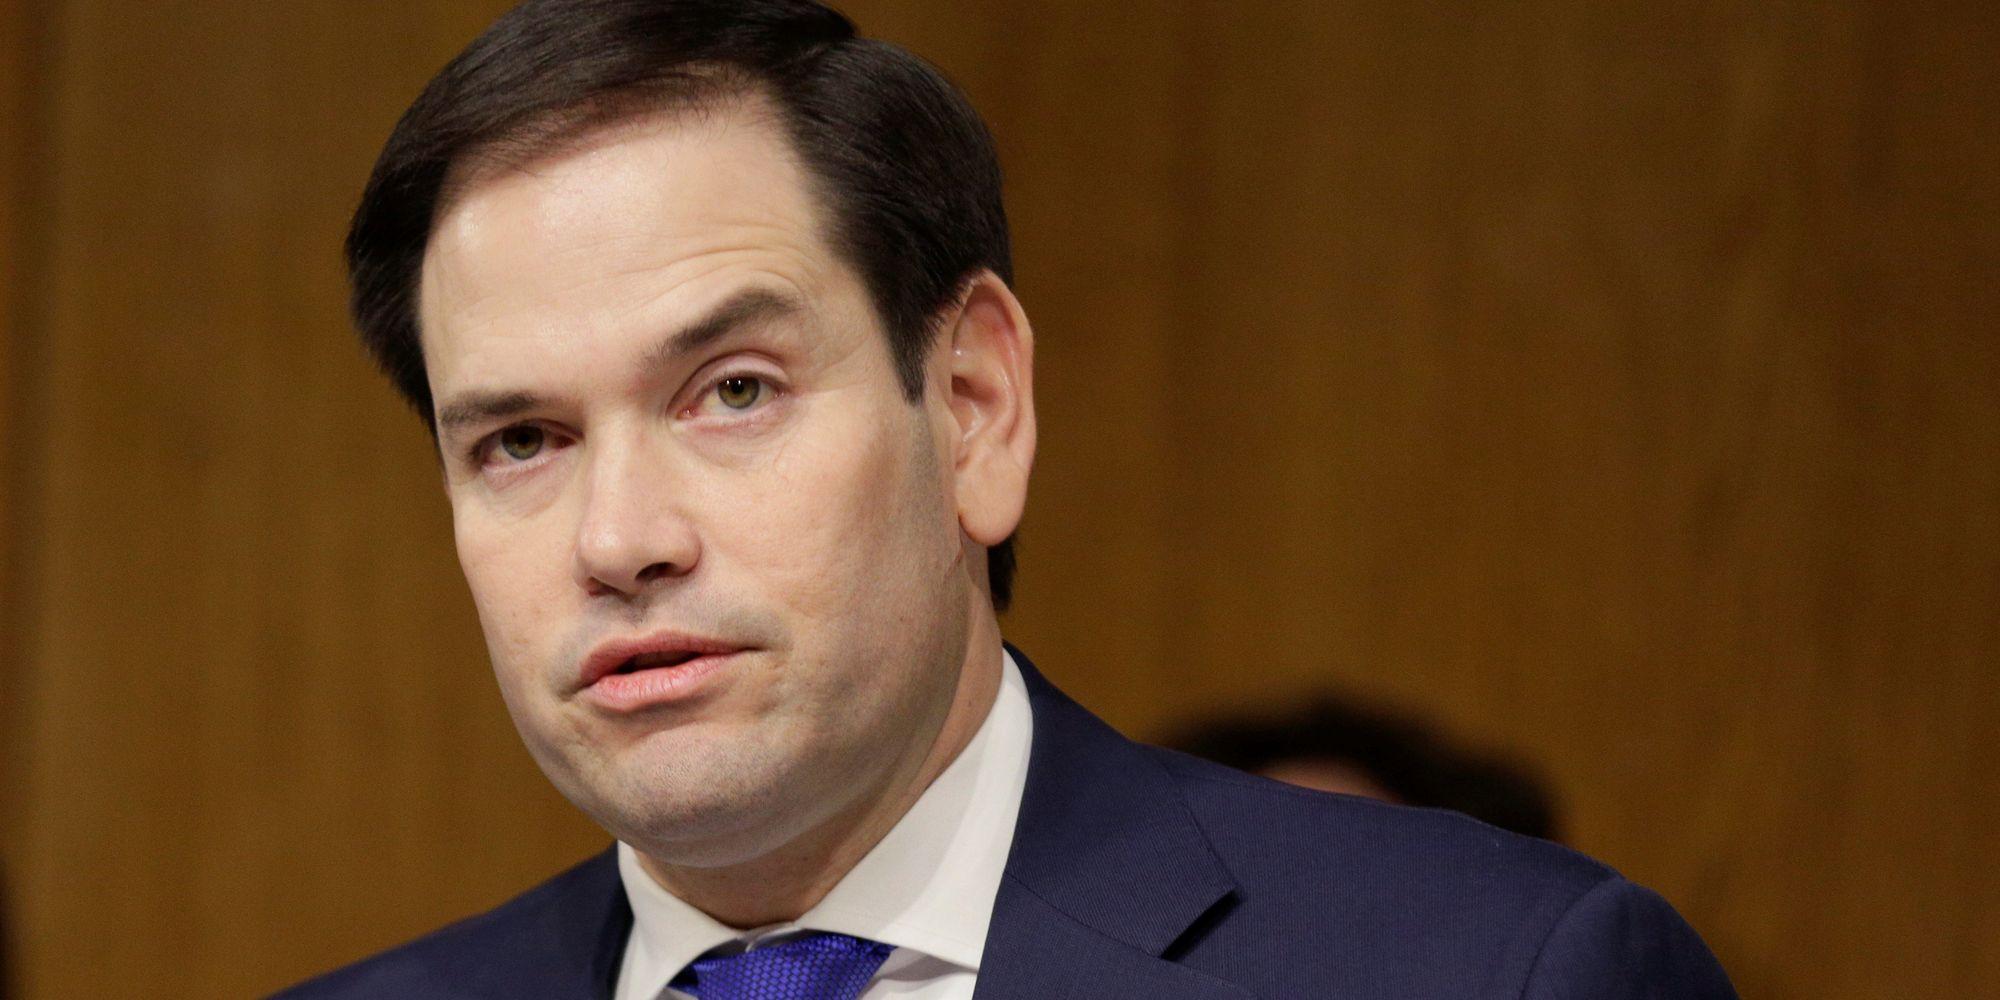 Marco Rubio Backs Rex Tillerson For Secretary Of State